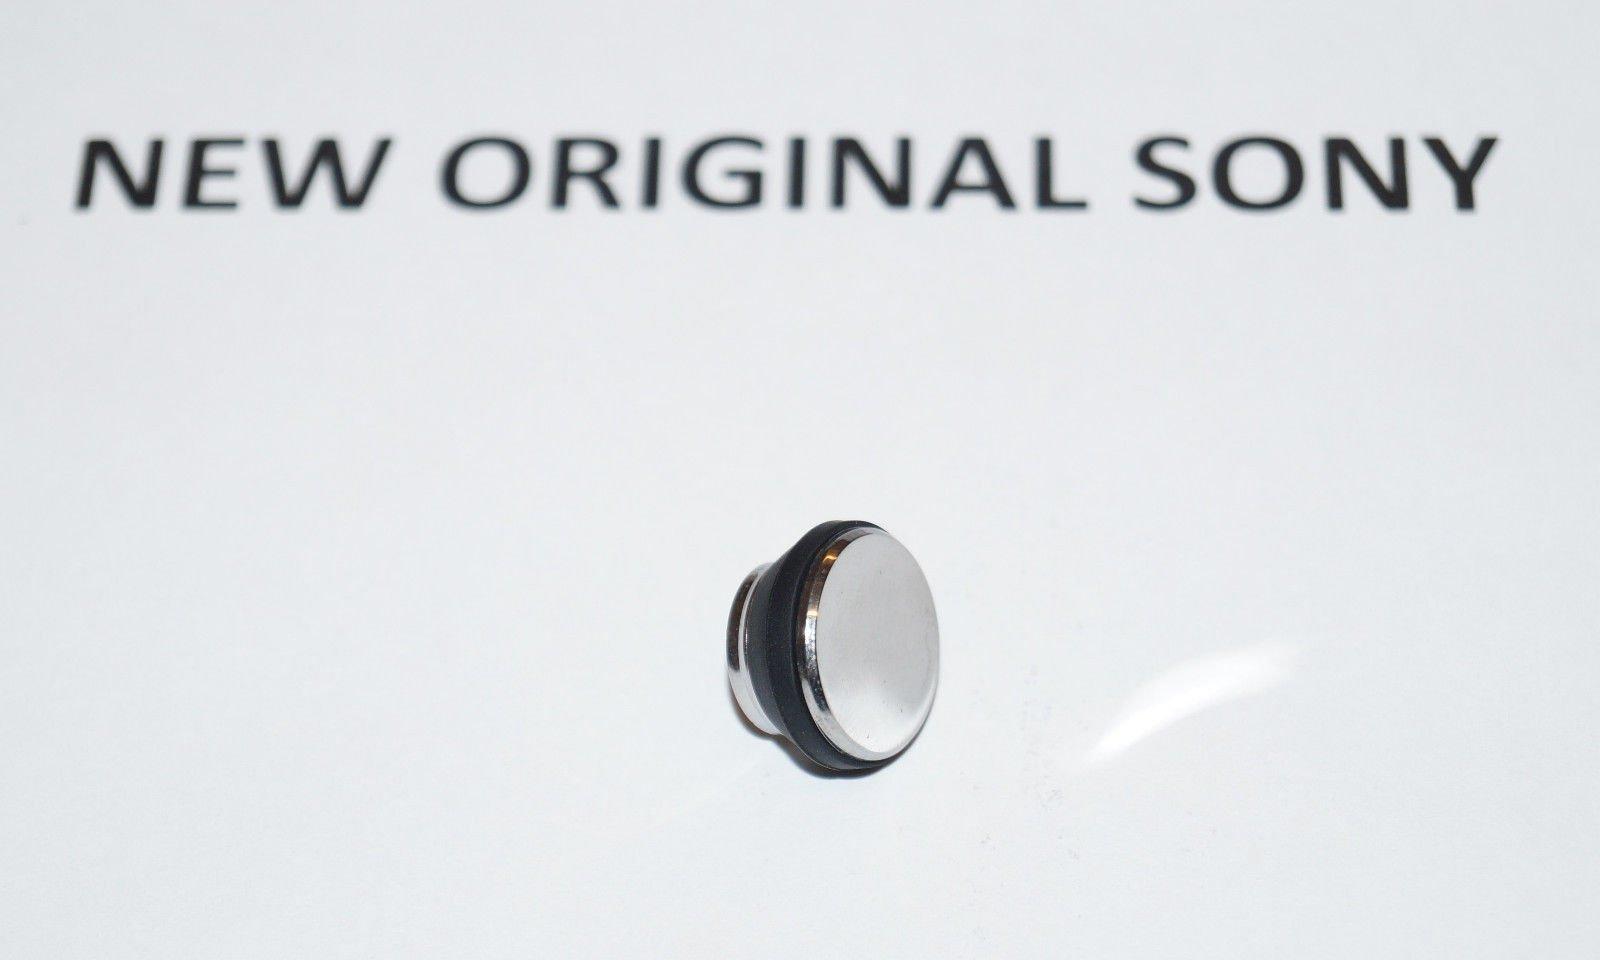 New Original Sony Knob Volume Button X25812931 X-2581-293-1 For XAV-62BT XAV-E62BT XAV-622 XAV-E622 XAV-63 XAV-63M XAV-64BT XAV-64BTM